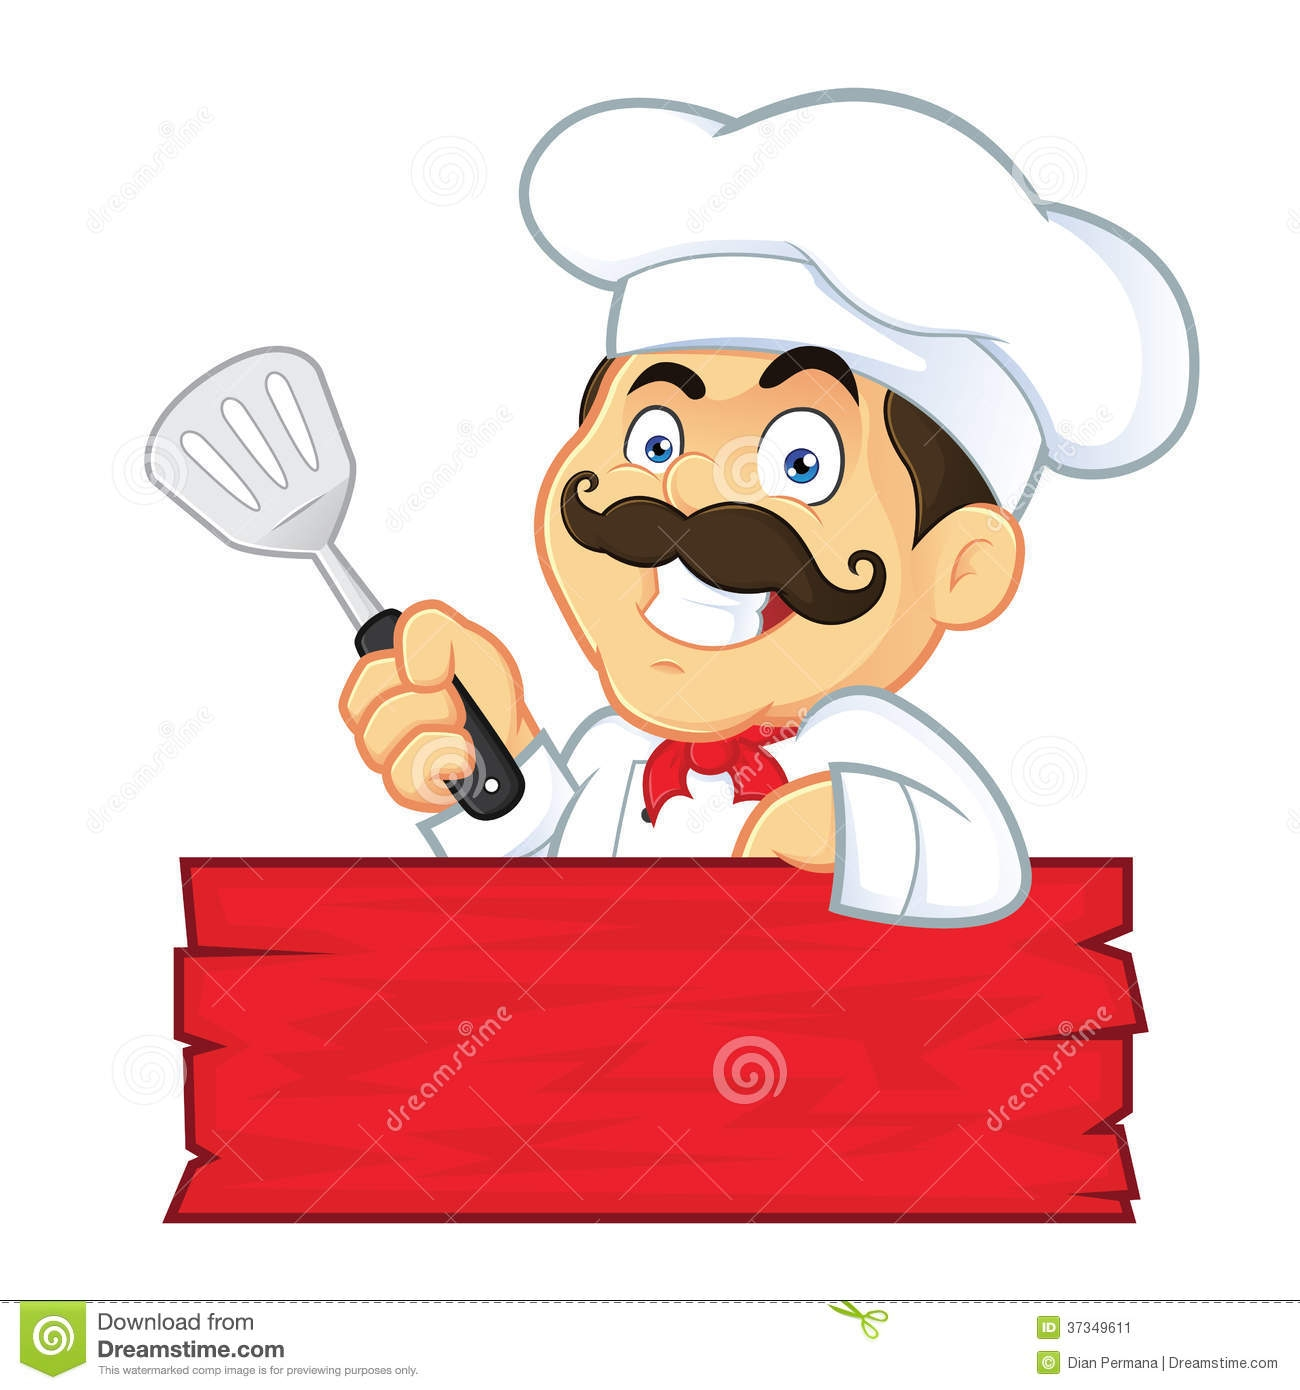 chef clipart cartoon #8